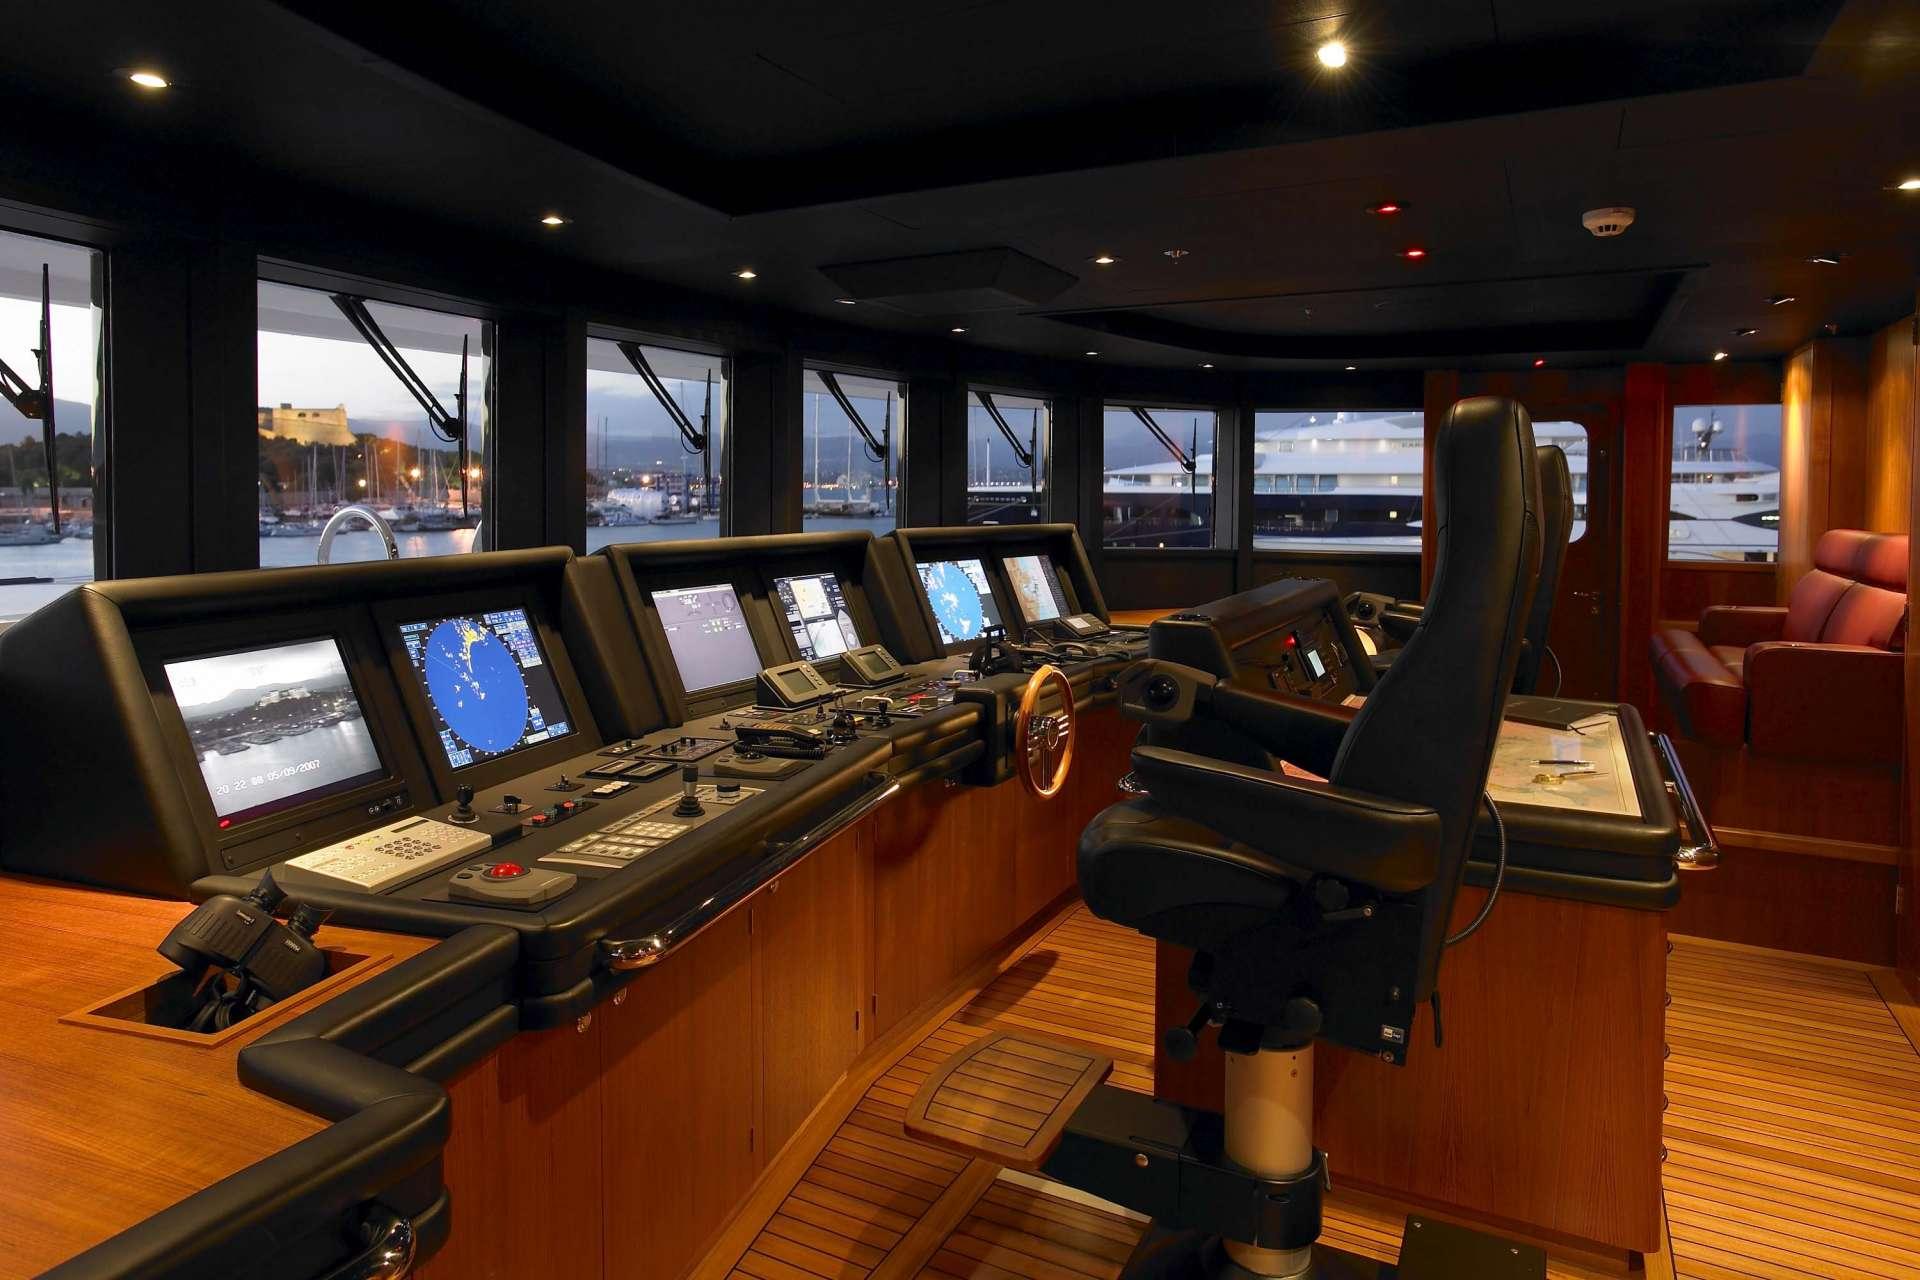 Wheelhouse Image Gallery Luxury Yacht Gallery Browser